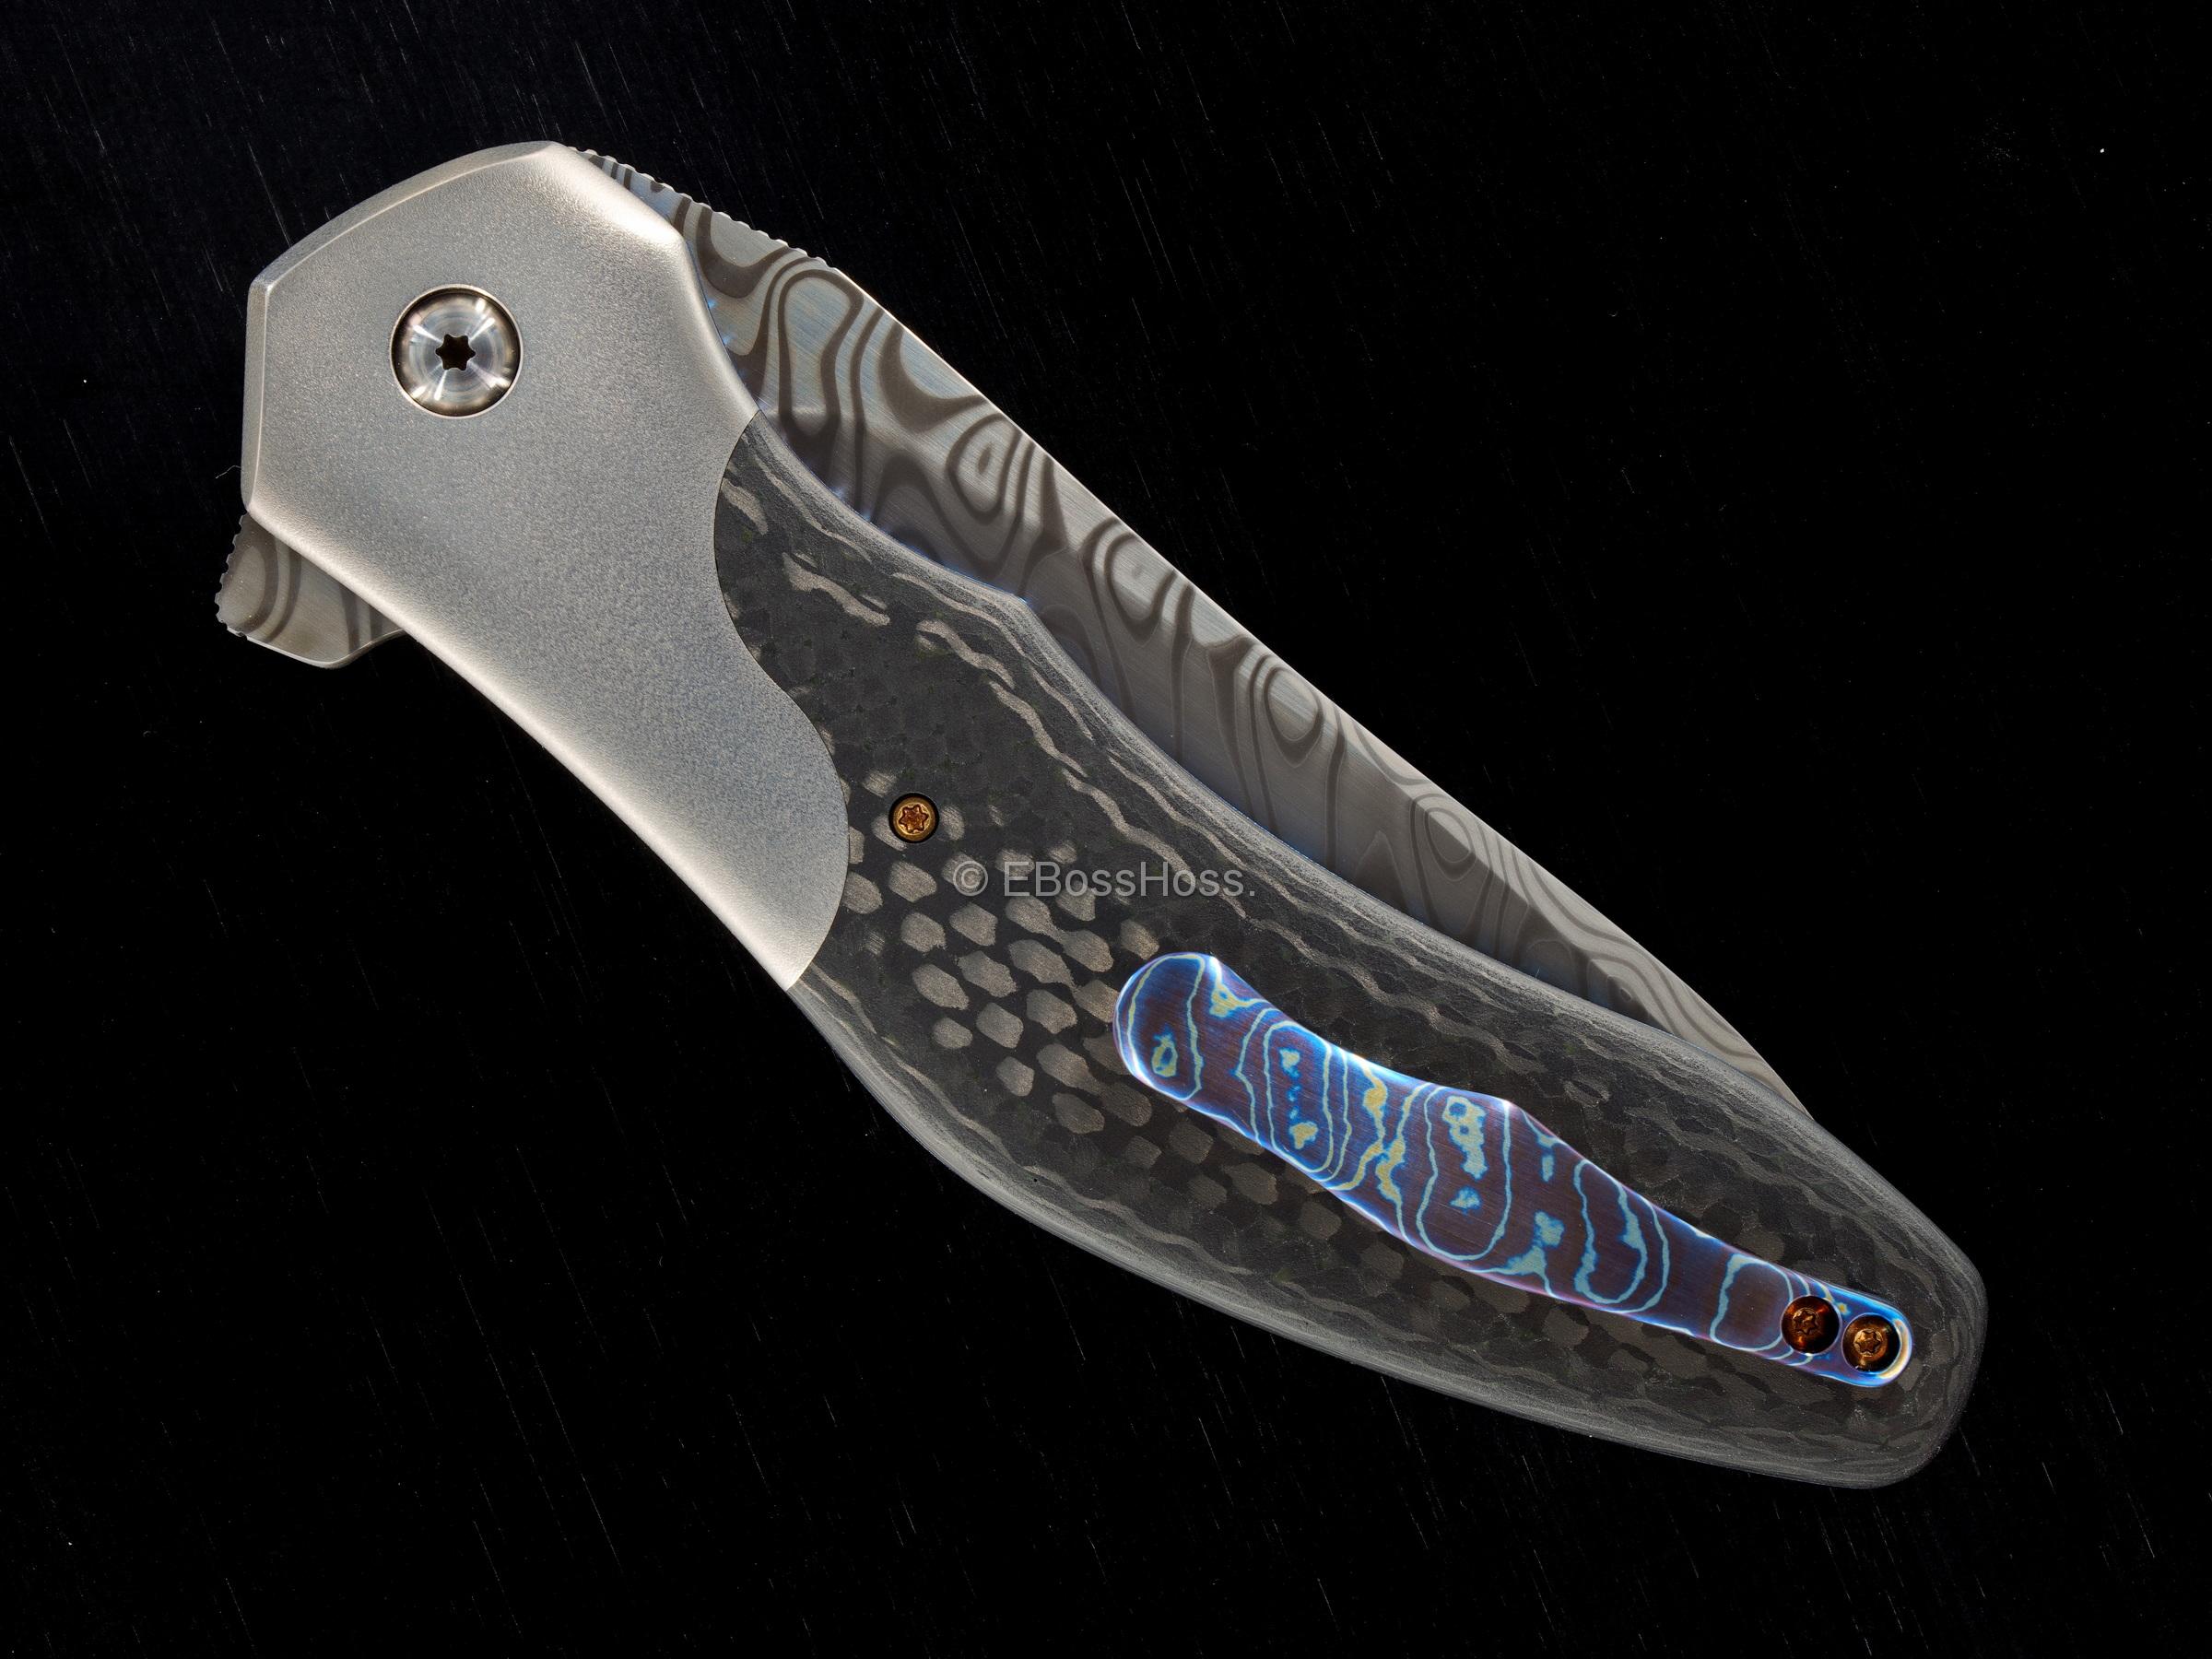 Gerry McGinnis Custom Deluxe Piston Flipper